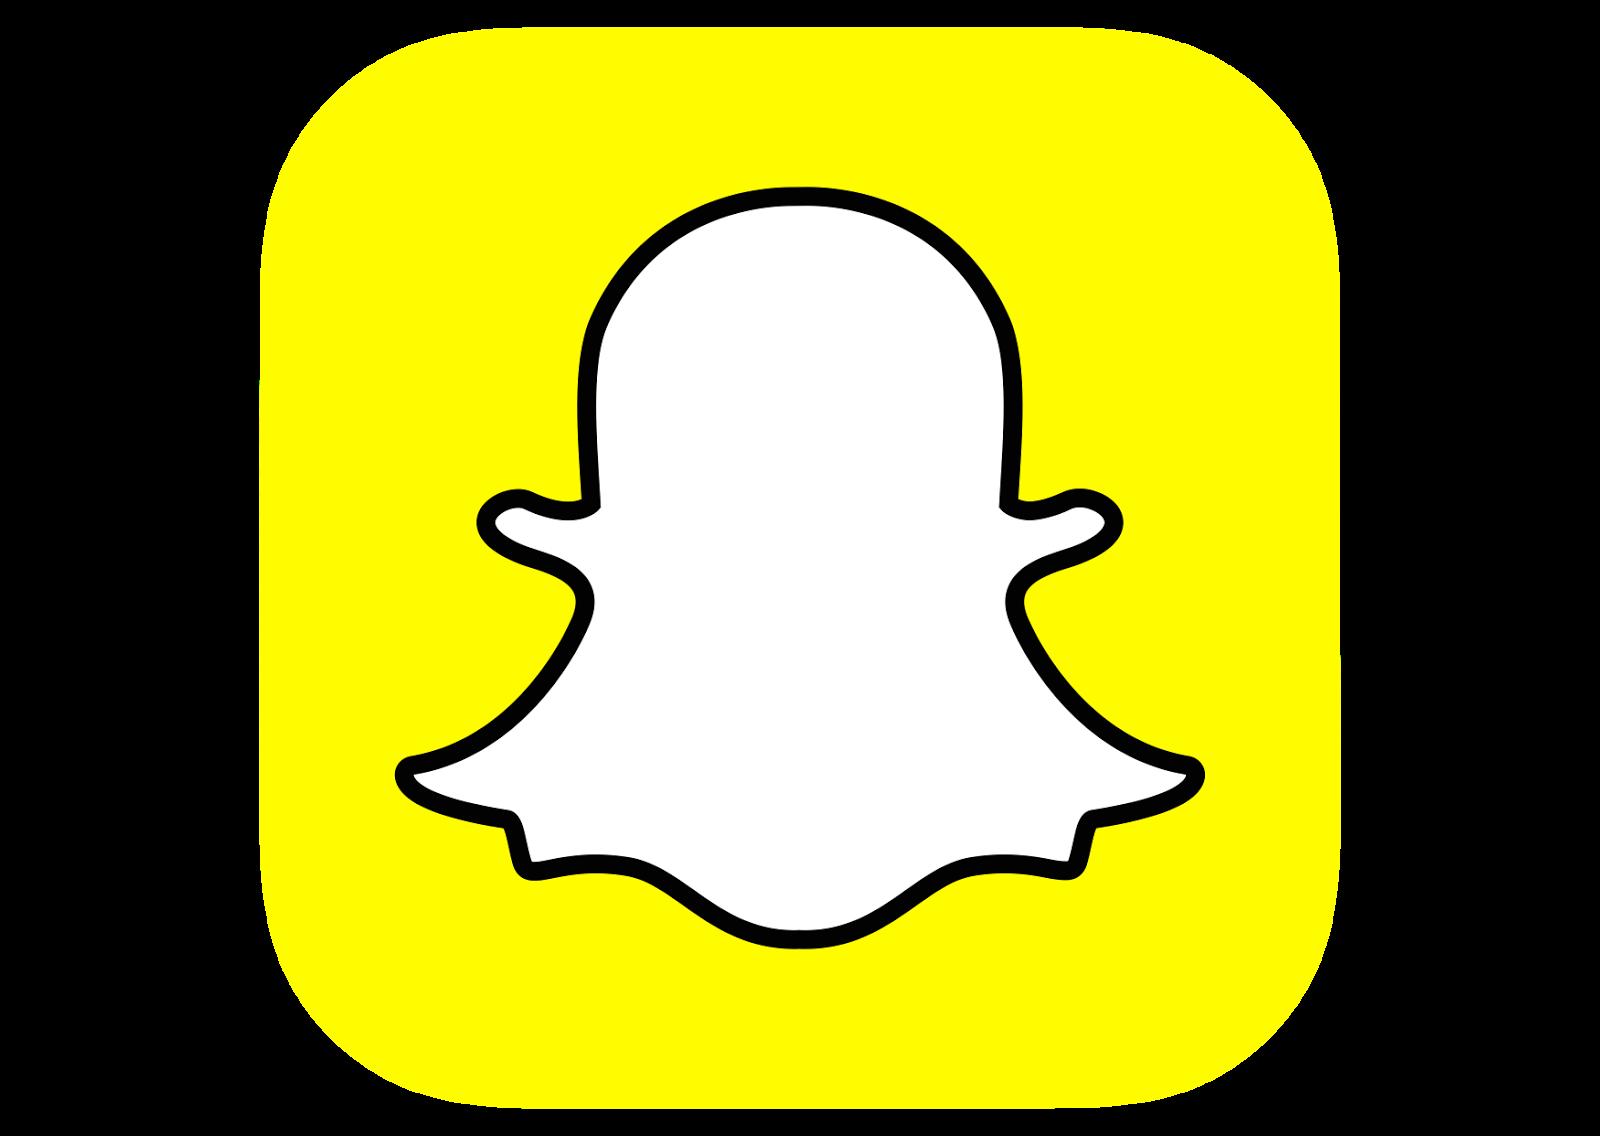 Snapchat Logo Clipart - Snapchat Clipart